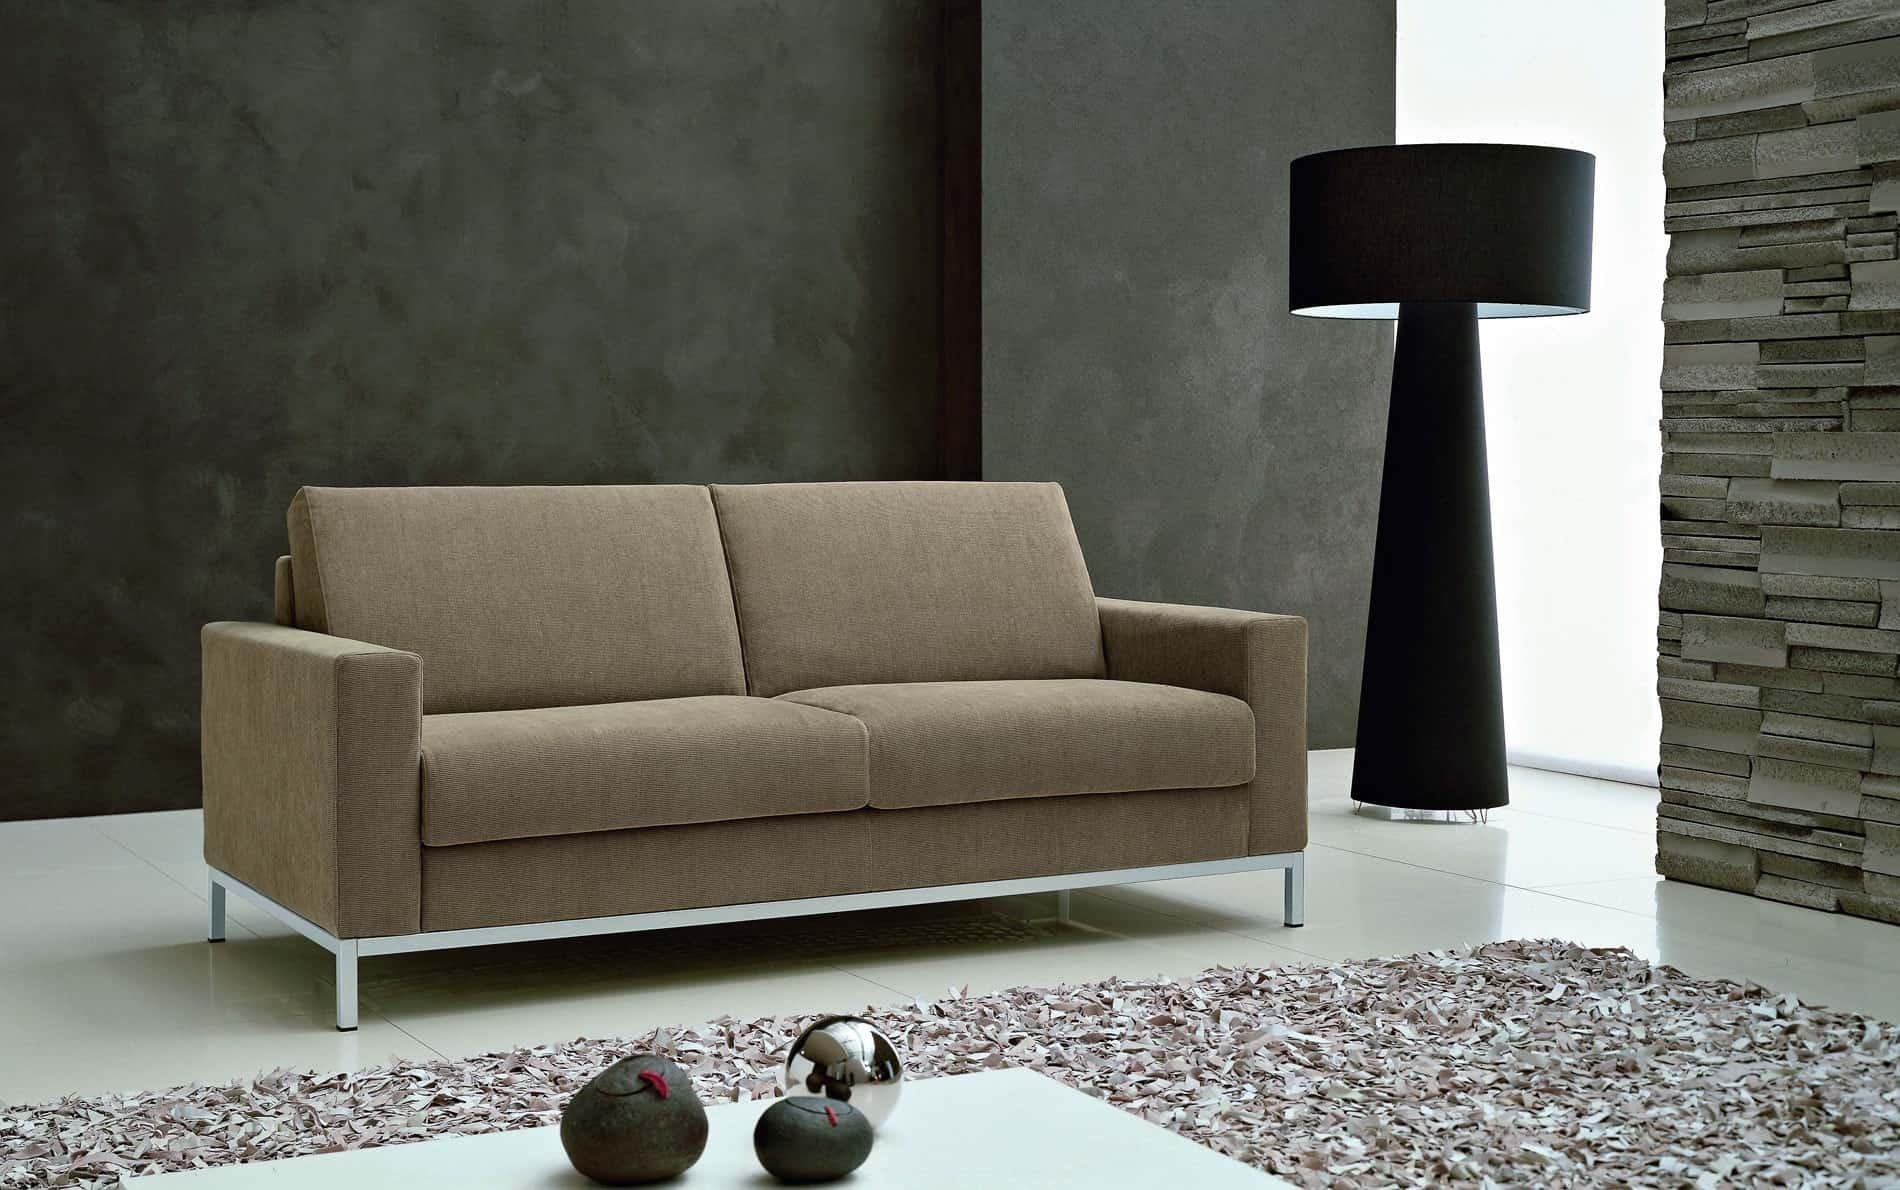 meta design schlafsofa bettsofa gim zweisitzer. Black Bedroom Furniture Sets. Home Design Ideas